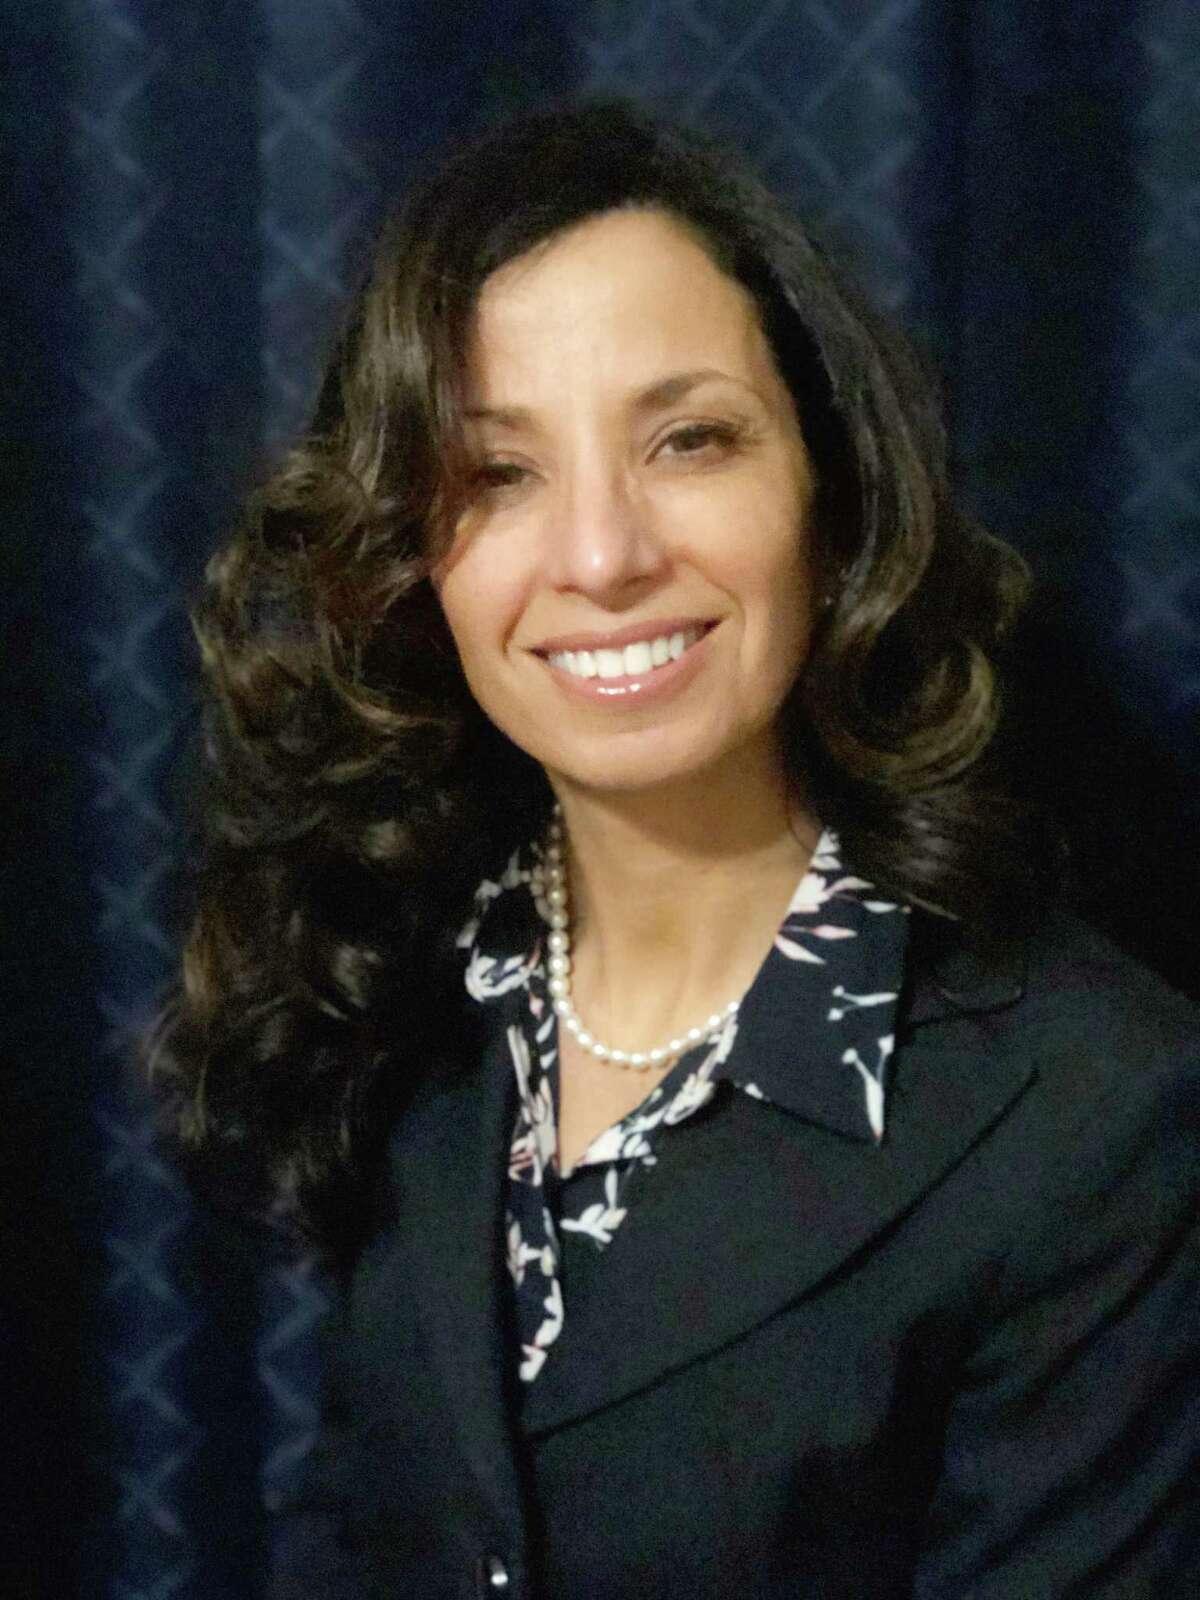 Ridgefield's new Superintendent of Schools, Susie DaSilva, began her tenure in April 2020, the times of coronavirus.